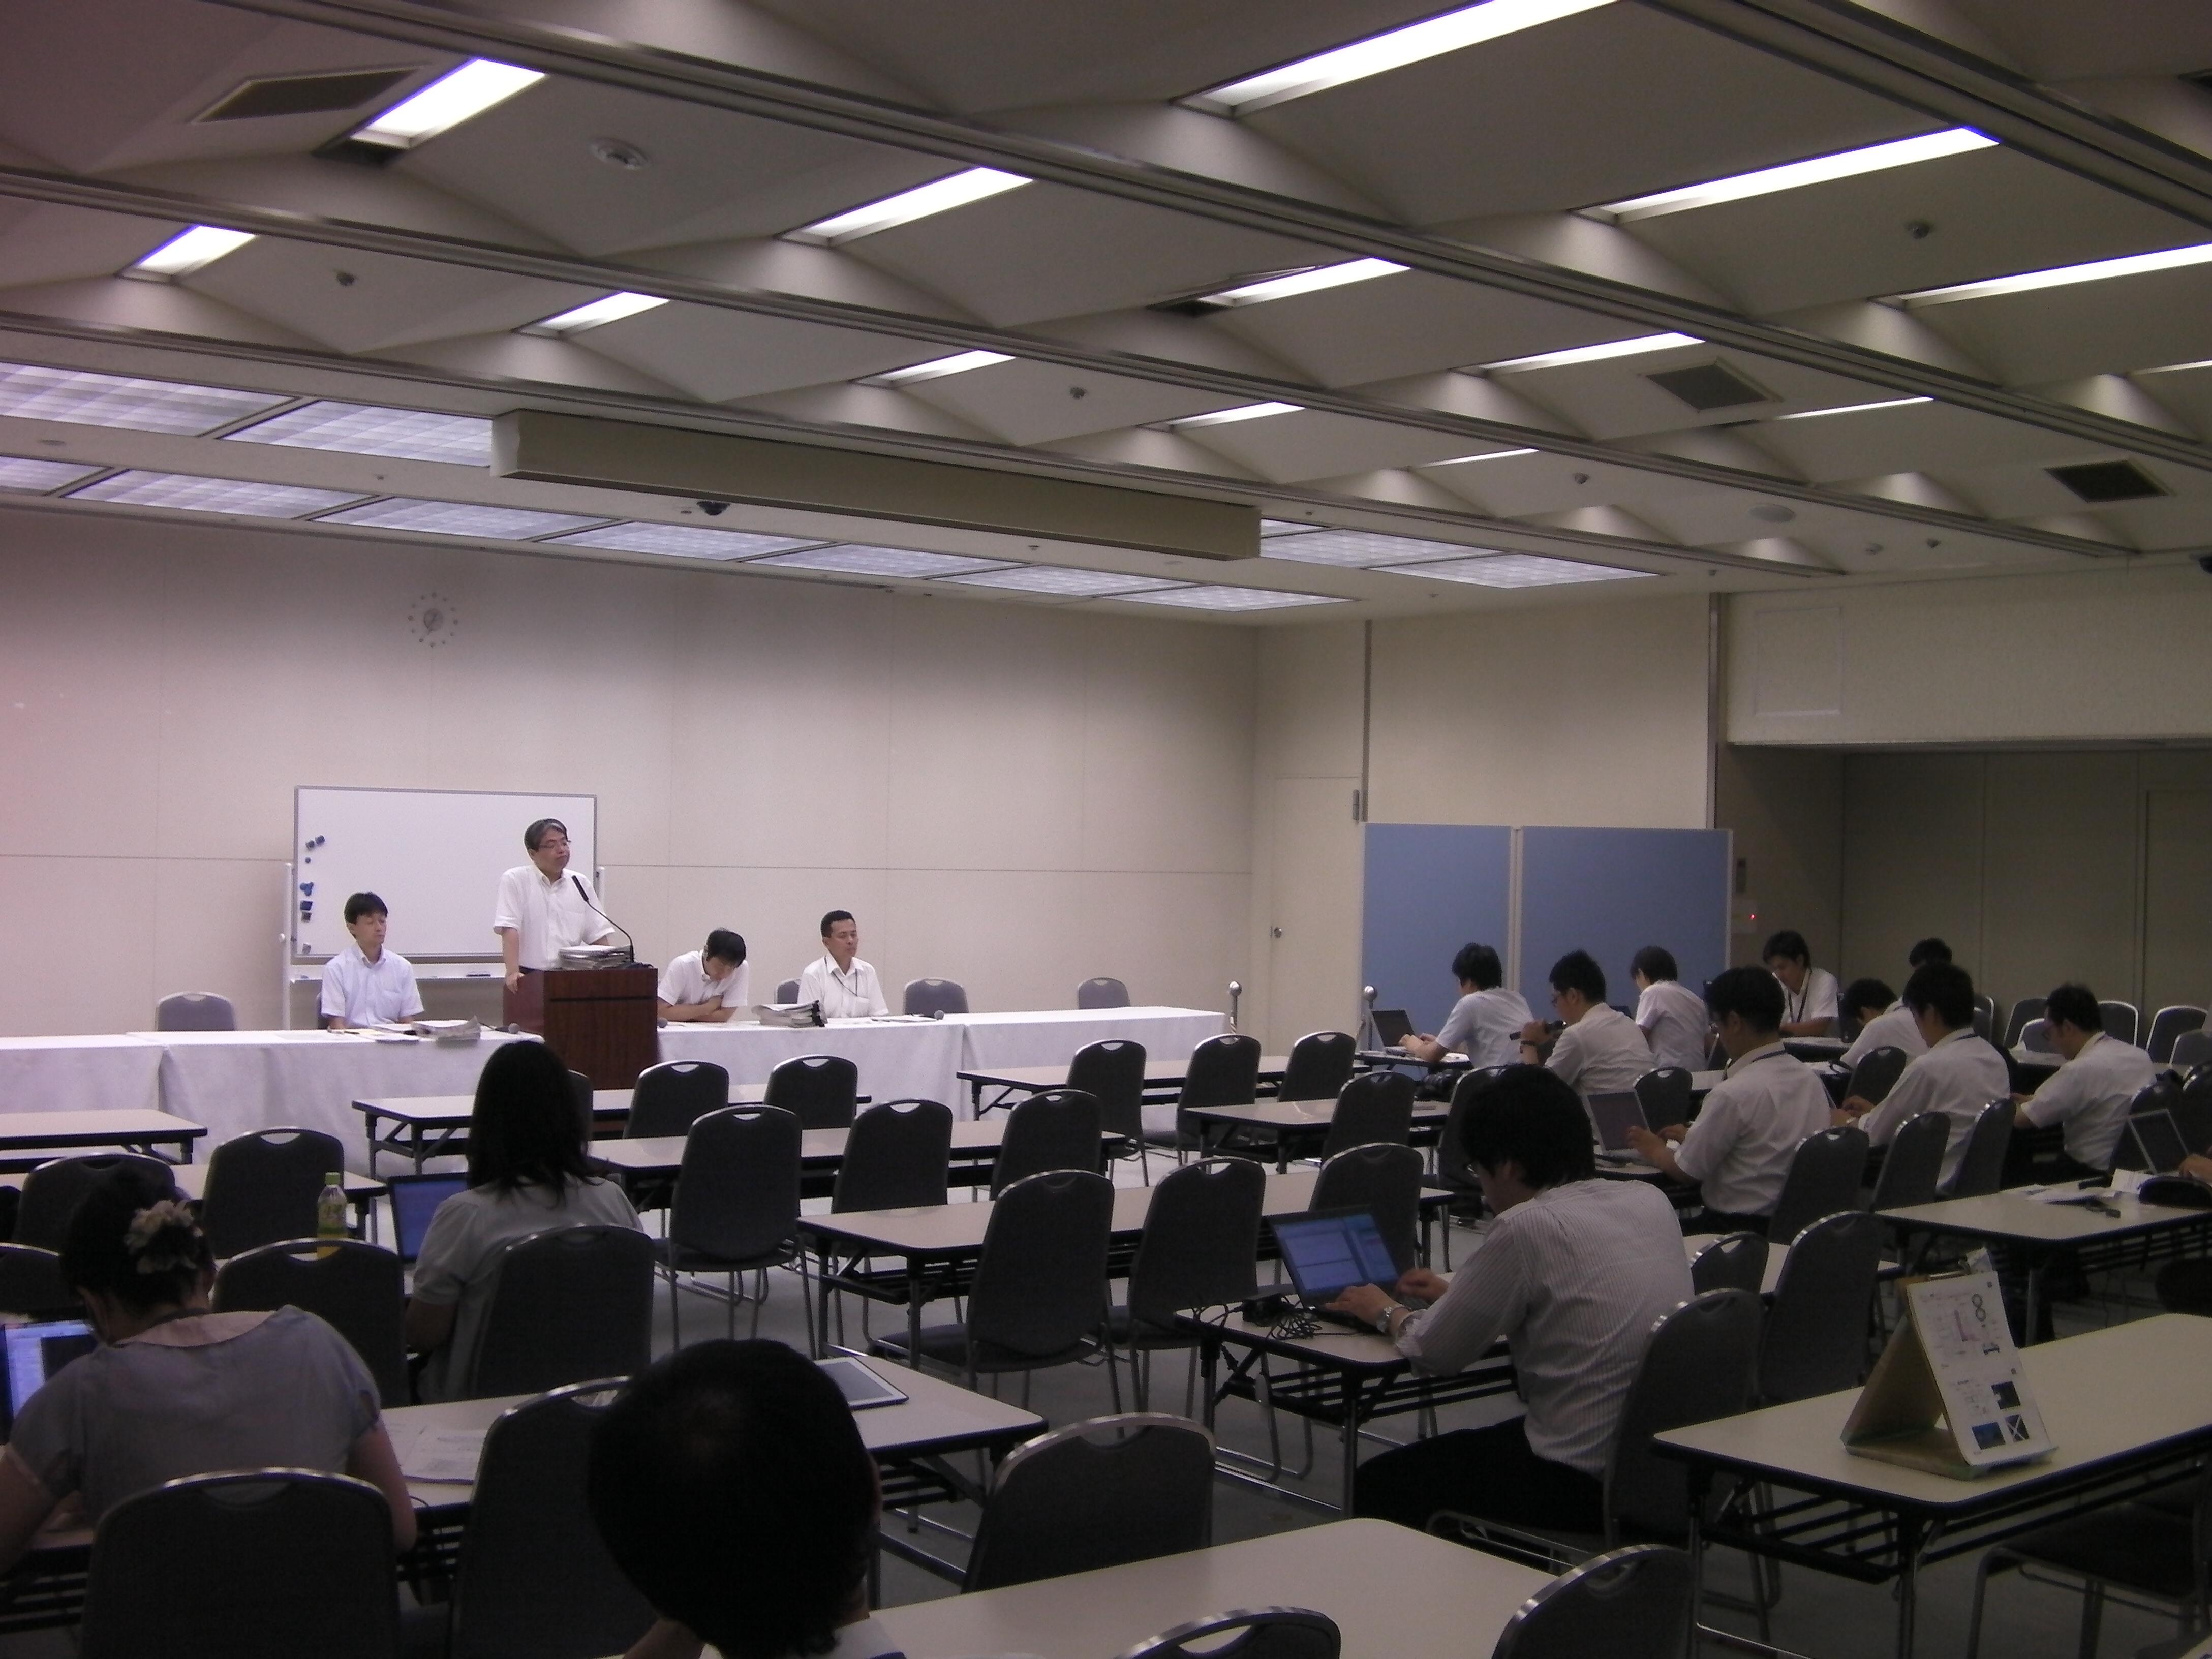 http://daily.magazine9.jp/m9/oshidori/SANY0094.JPG